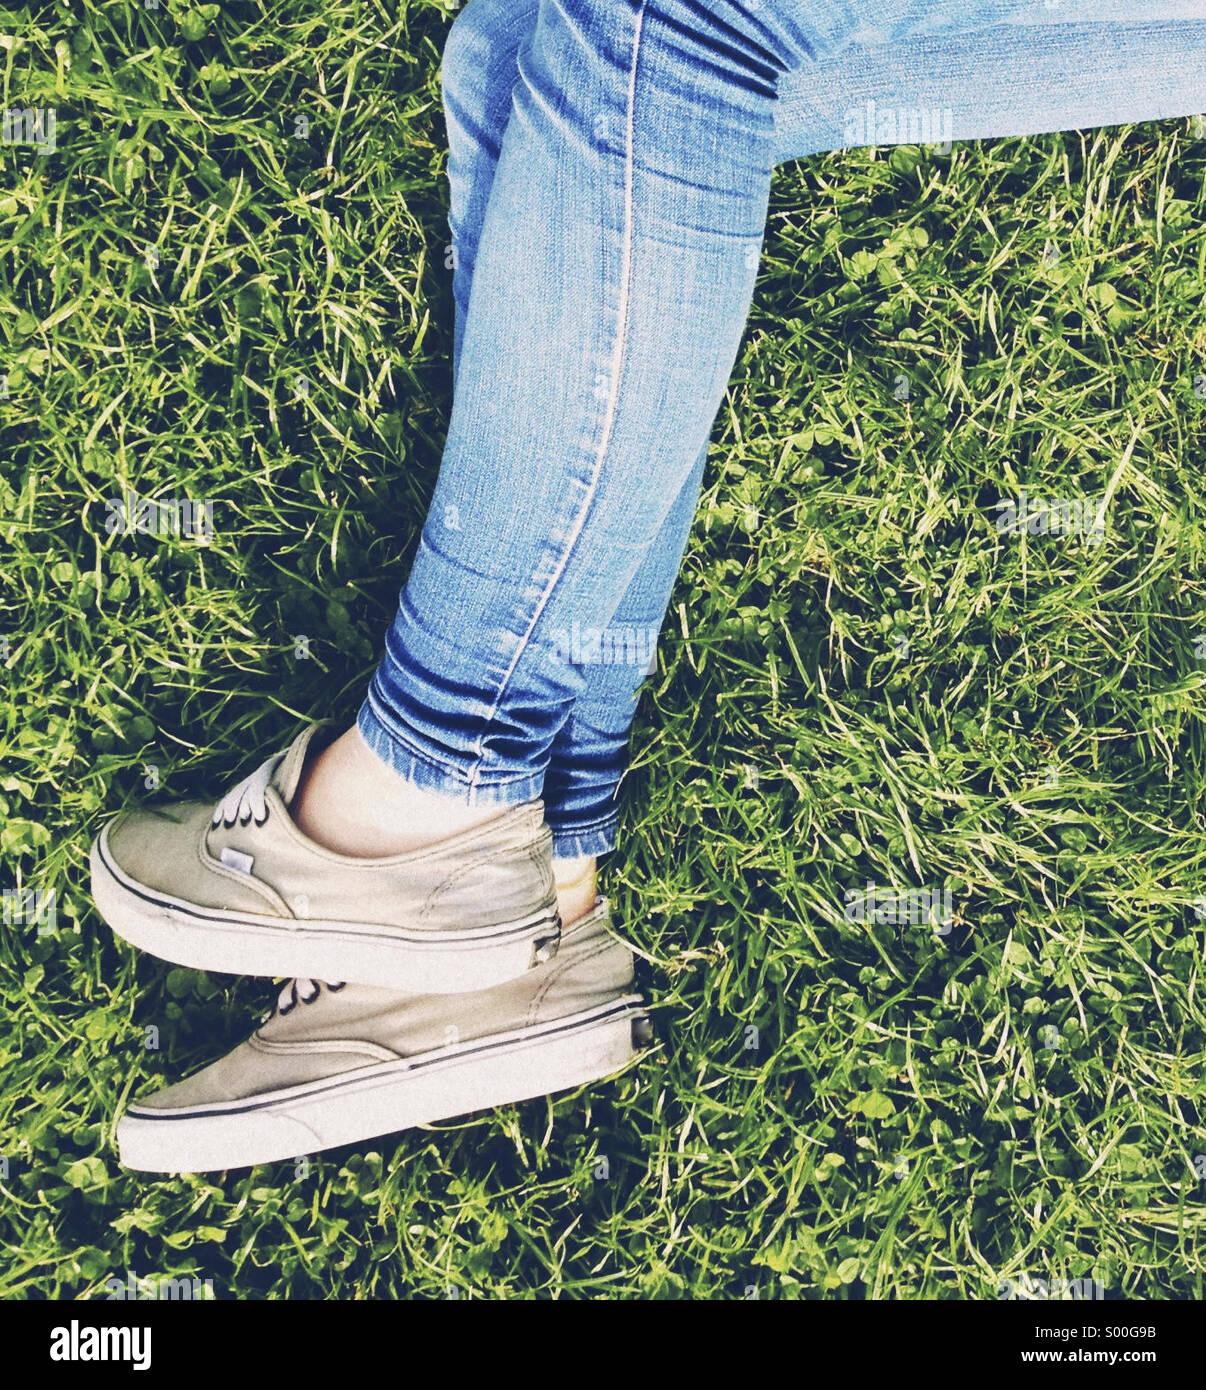 Verlegung auf Rasen Stockbild